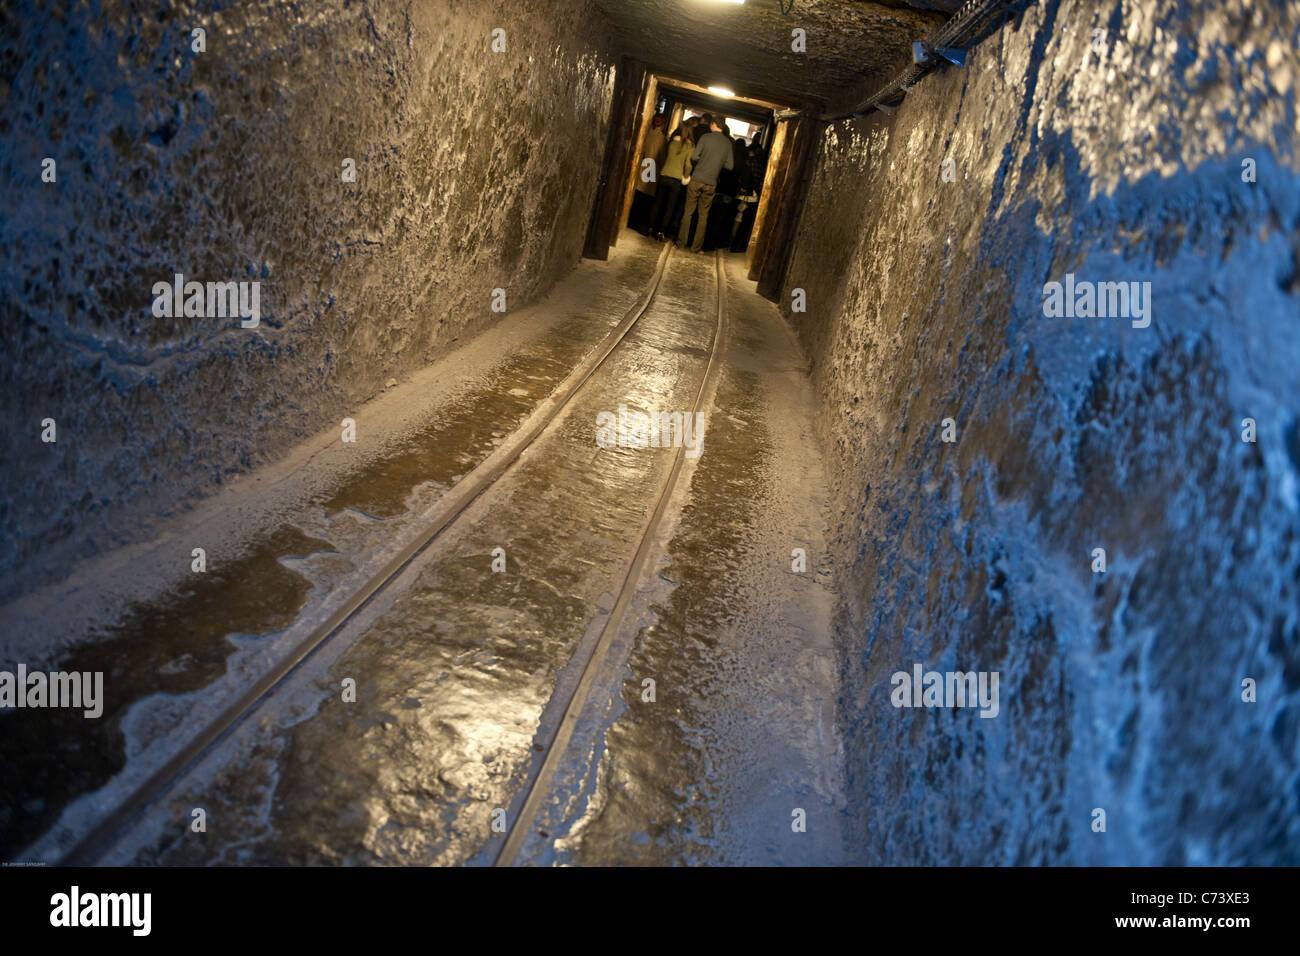 Salt mine train tract in Poland - Stock Image